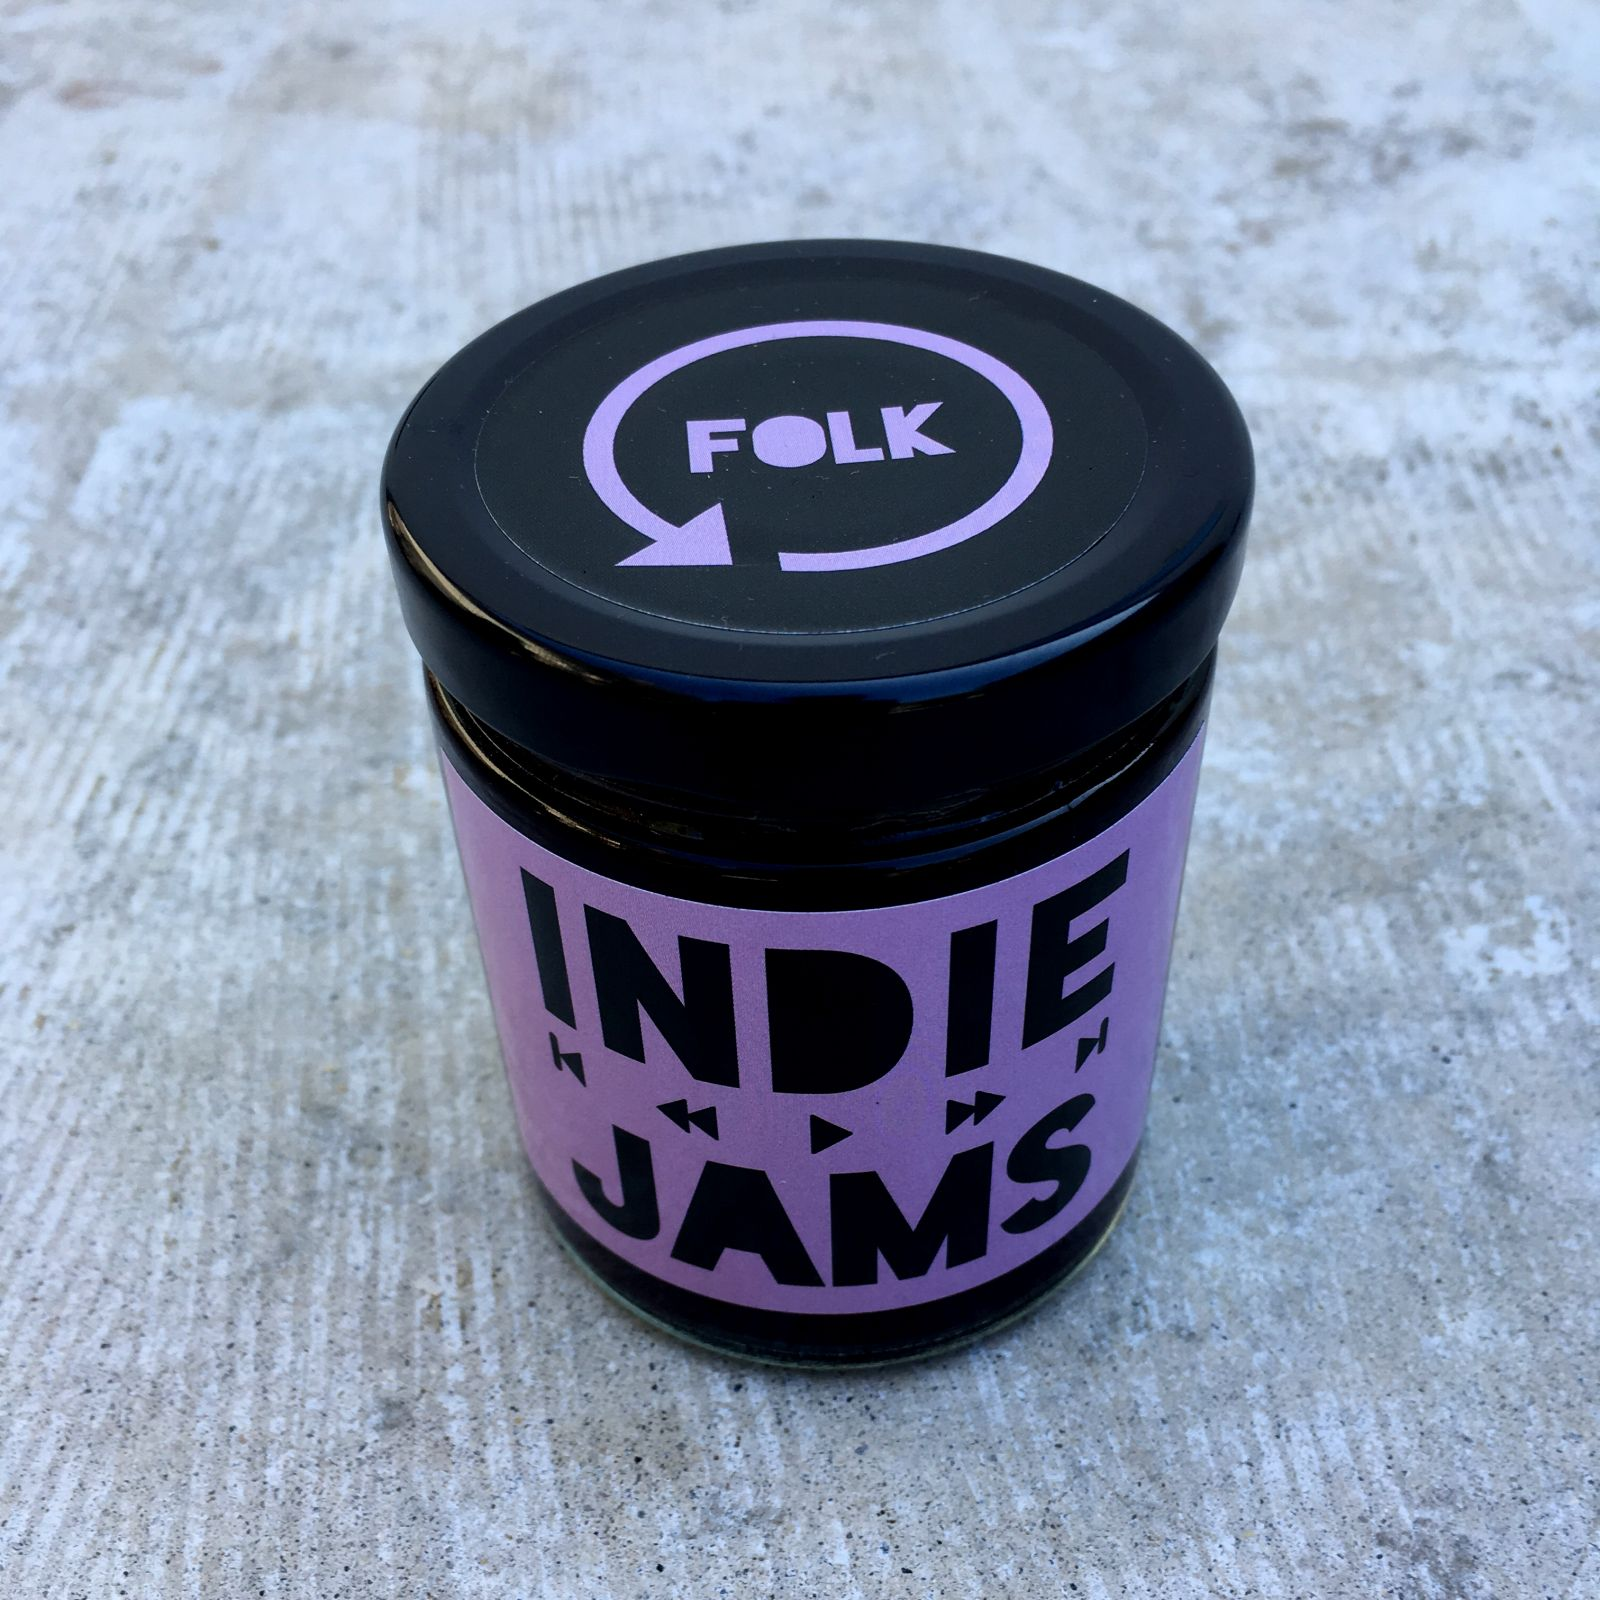 Indie Jams FOLK Jam